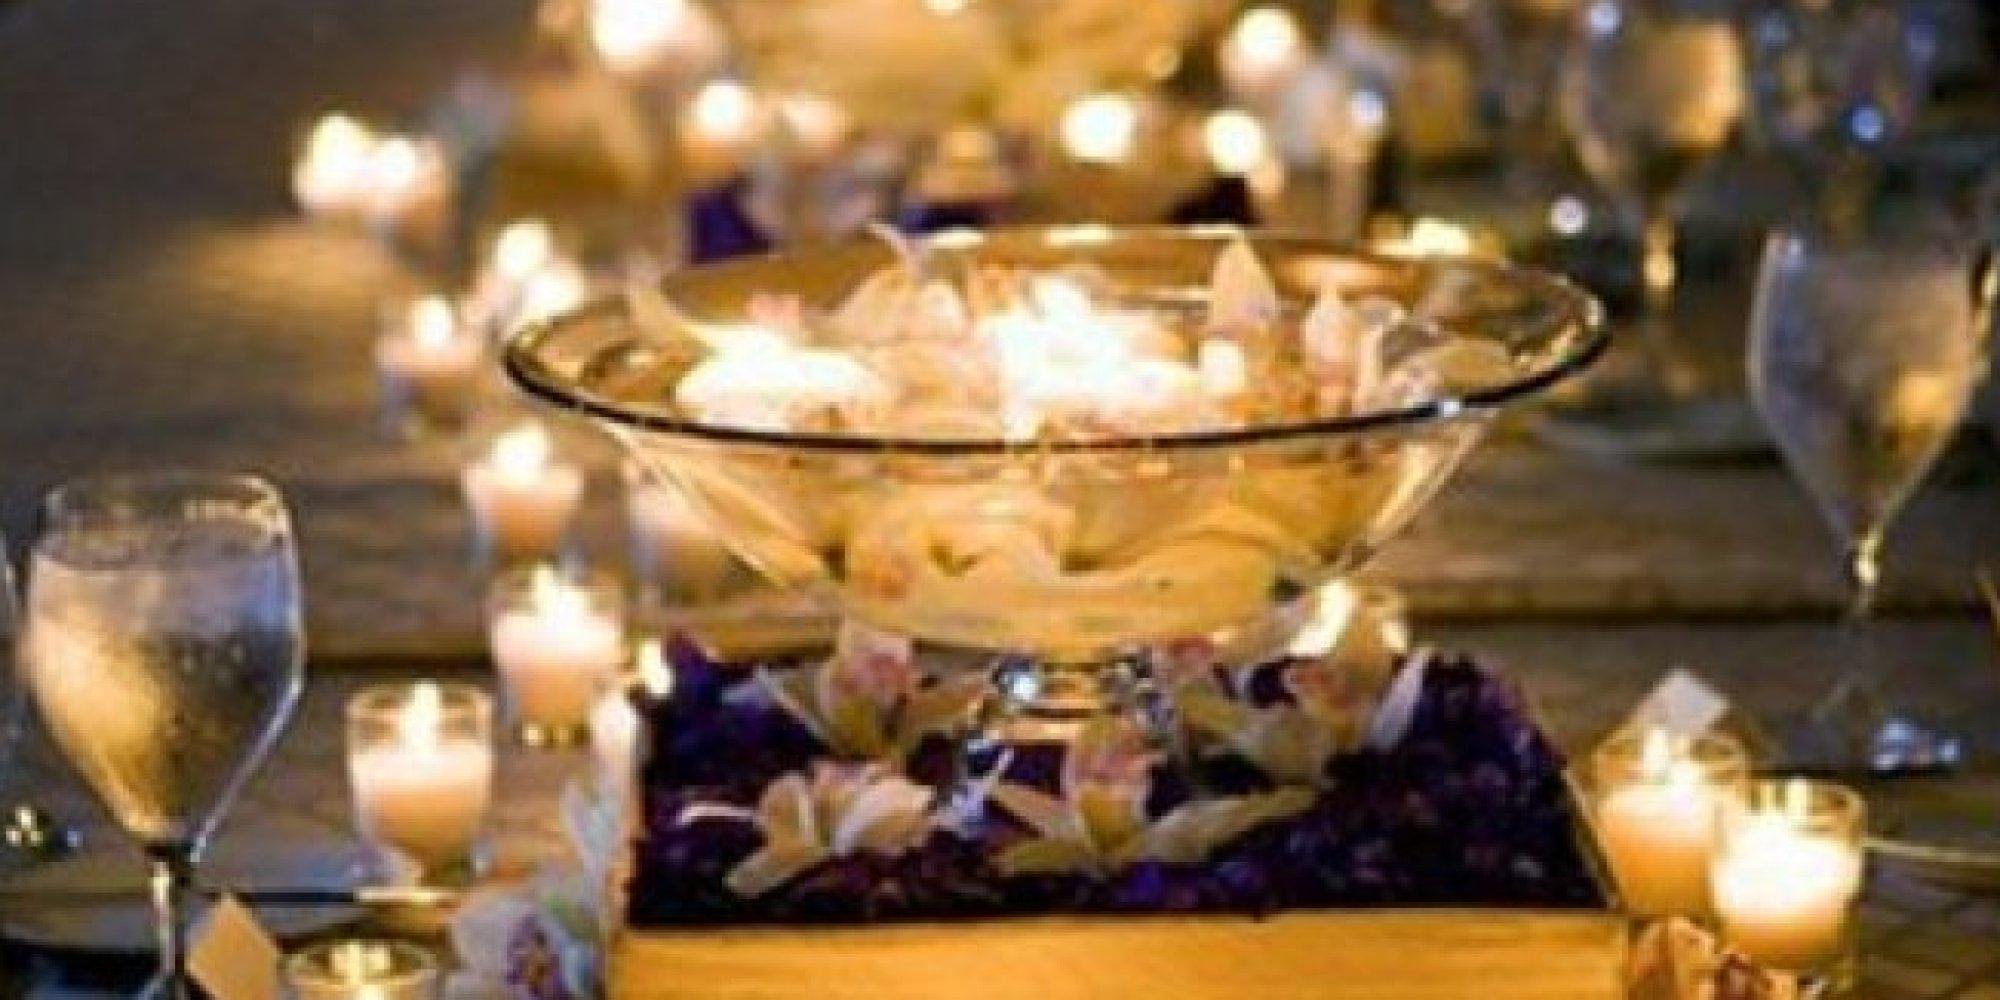 50 Wedding Centerpiece Ideas That Don't Involve Flowers